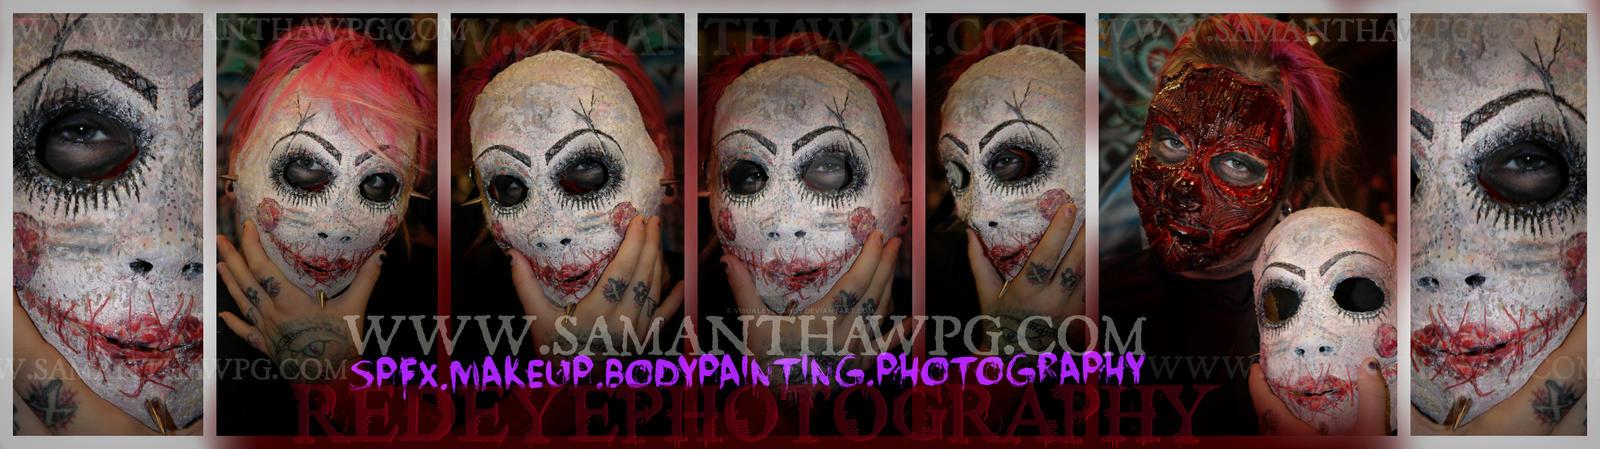 Creepy Doll Mask by VisualEyeCandy